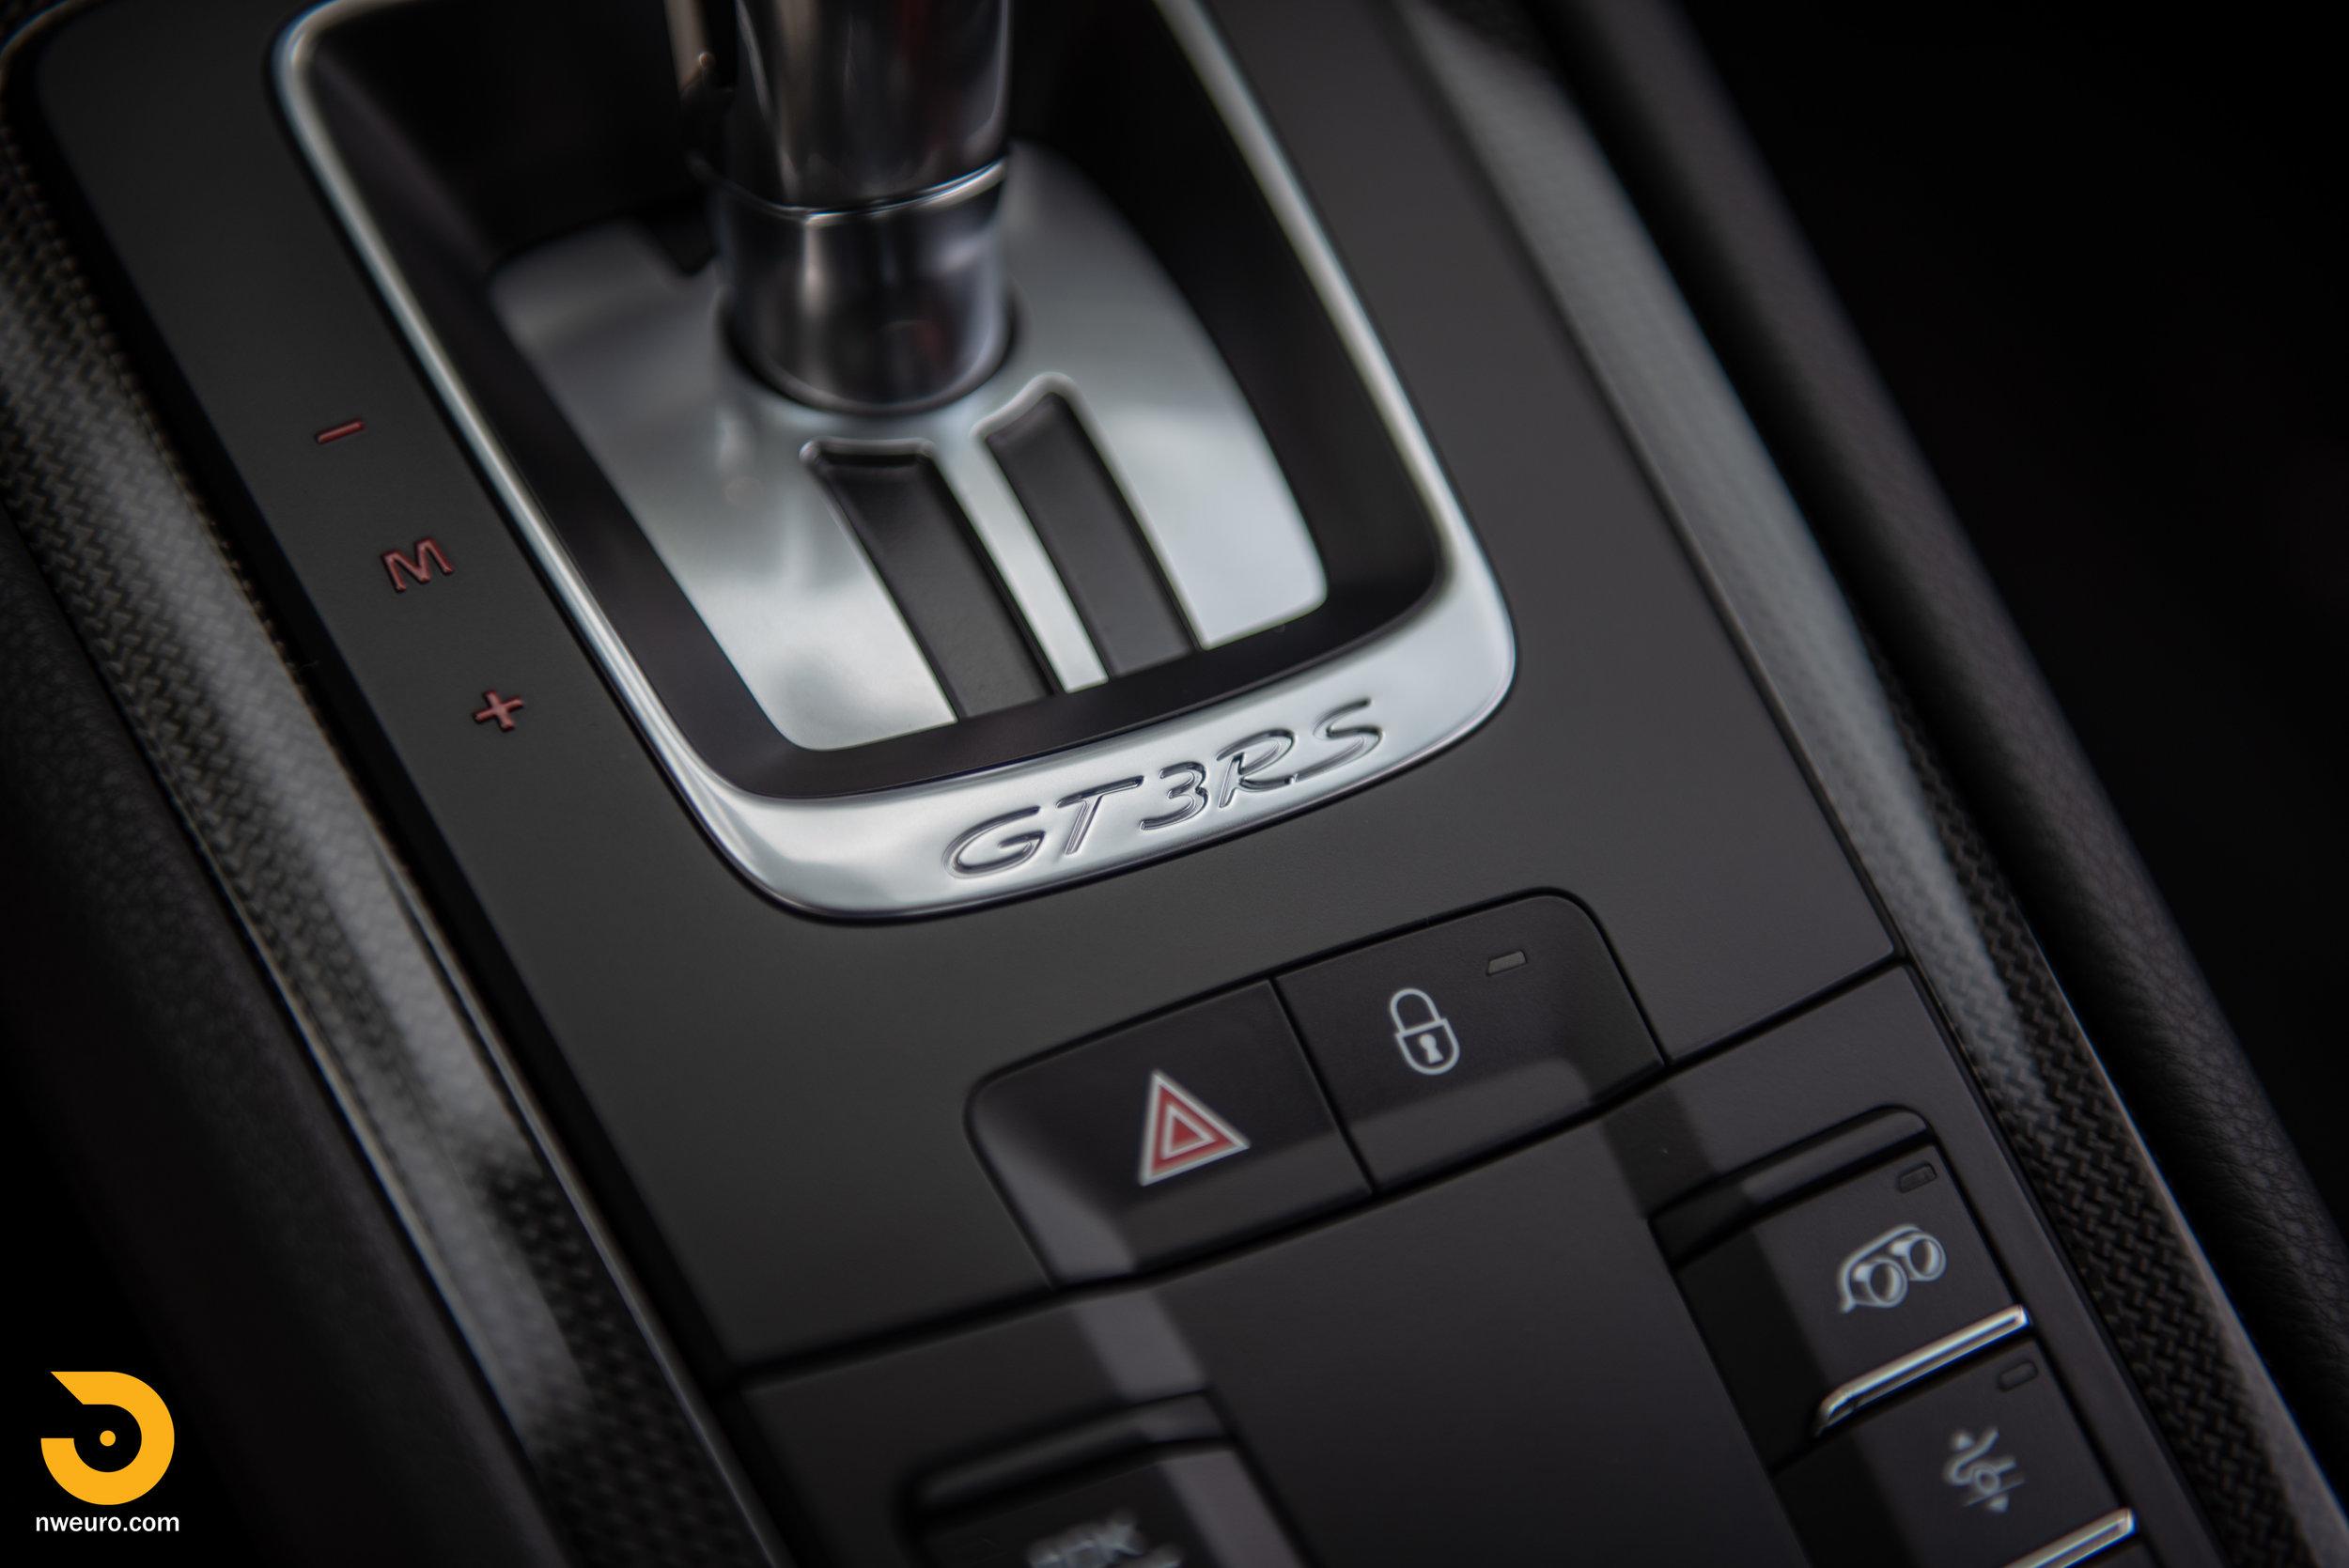 2019 Porsche GT3 RS - Chalk-33.jpg